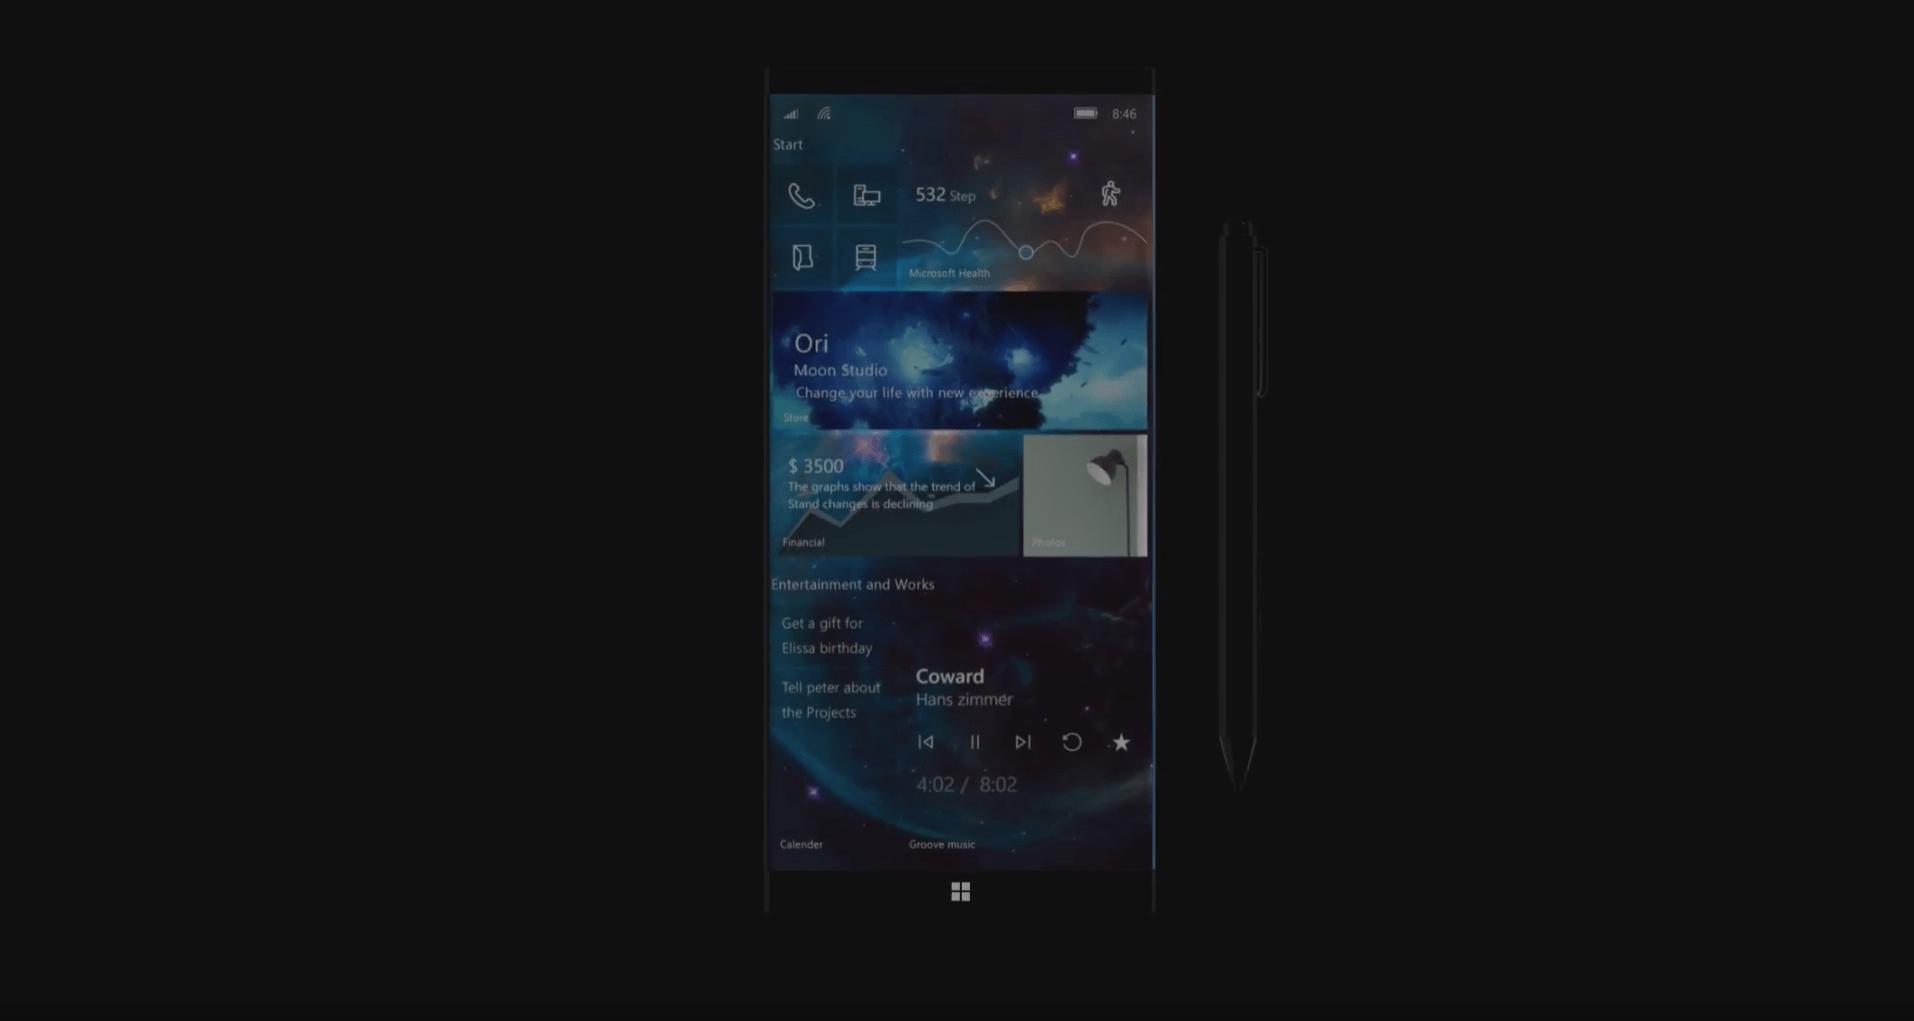 Glücks-Dating-App Windows Telefon